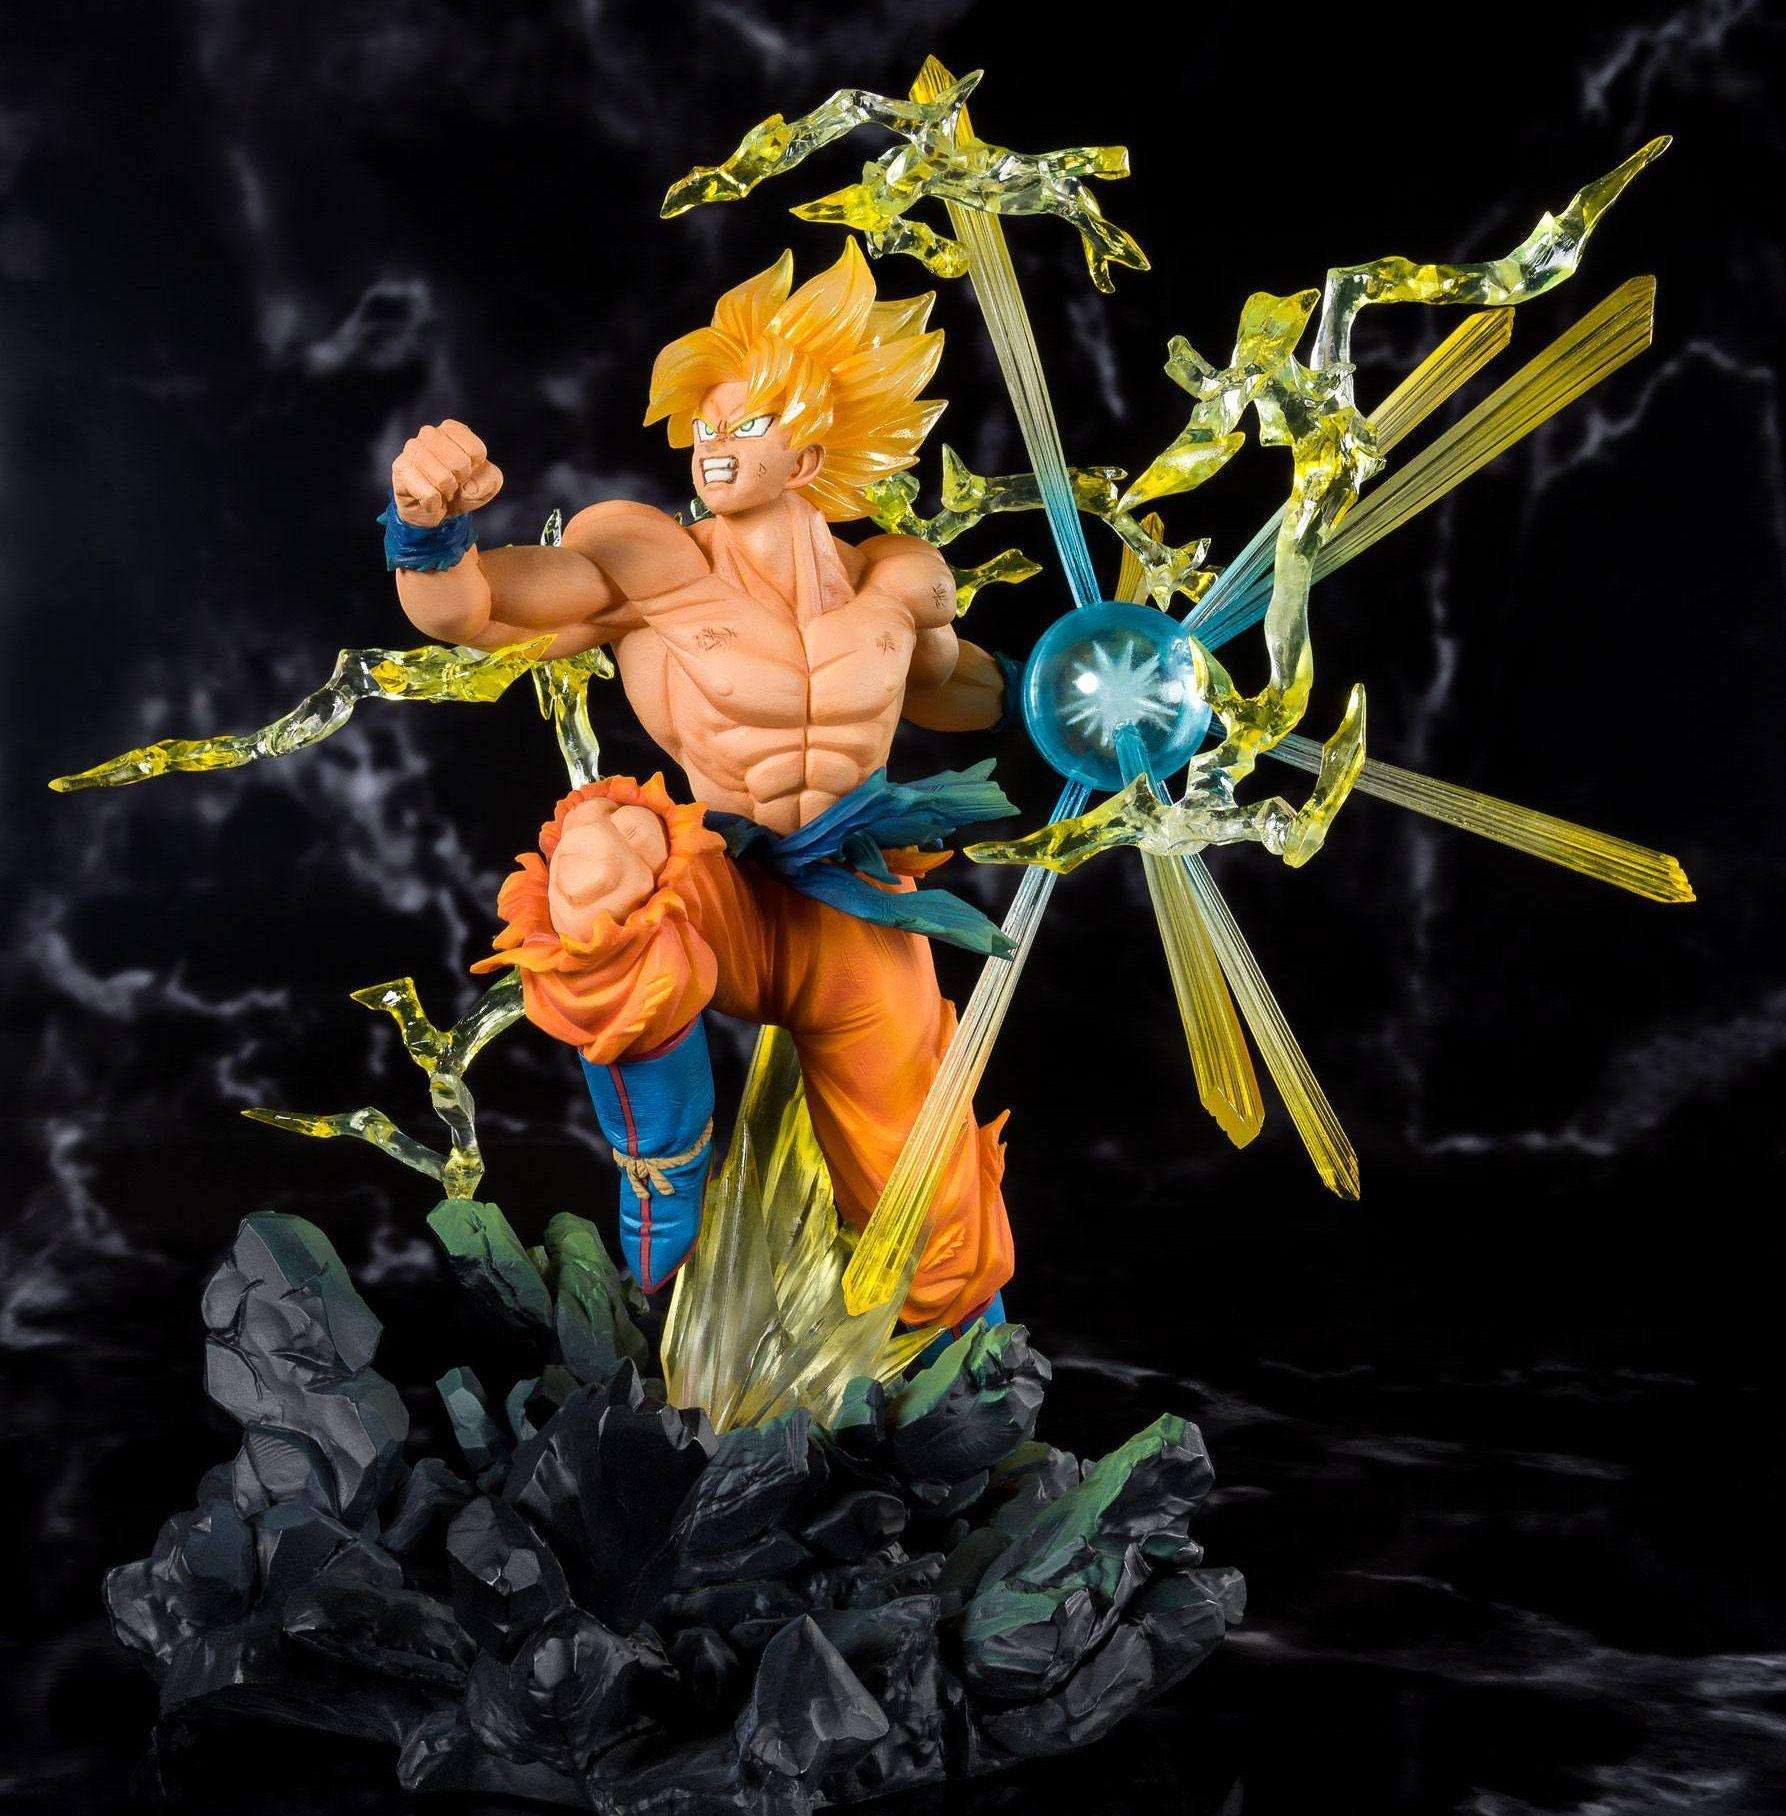 Dragonball Z Figuartszero Pvc Statue Super Saiyan Son Goku Tamashii Web Exclusive 20 Cm Animegami Store Goku Super Saiyan Dragon Ball Artwork Goku